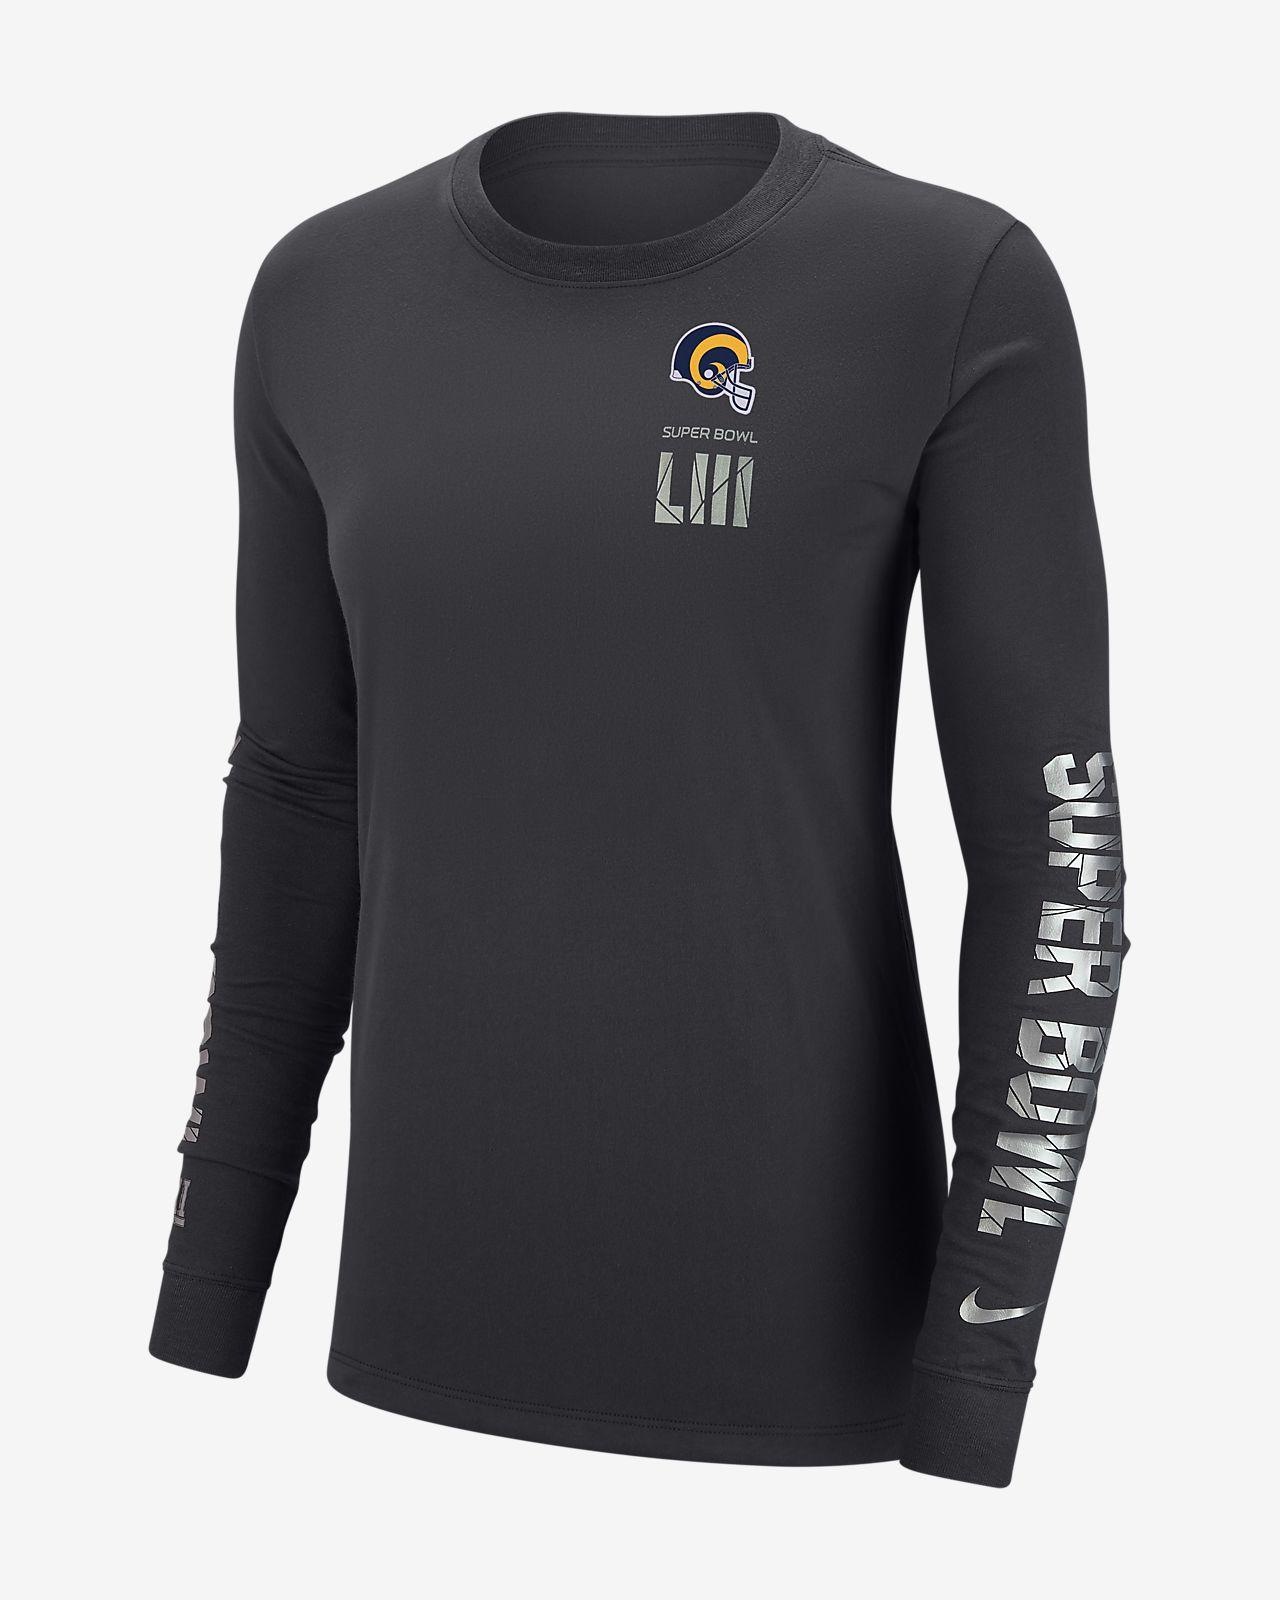 Nike Dri-FIT Super Bowl LIII (NFL Rams) Women s Long-Sleeve T-Shirt ... db418fabe8cd